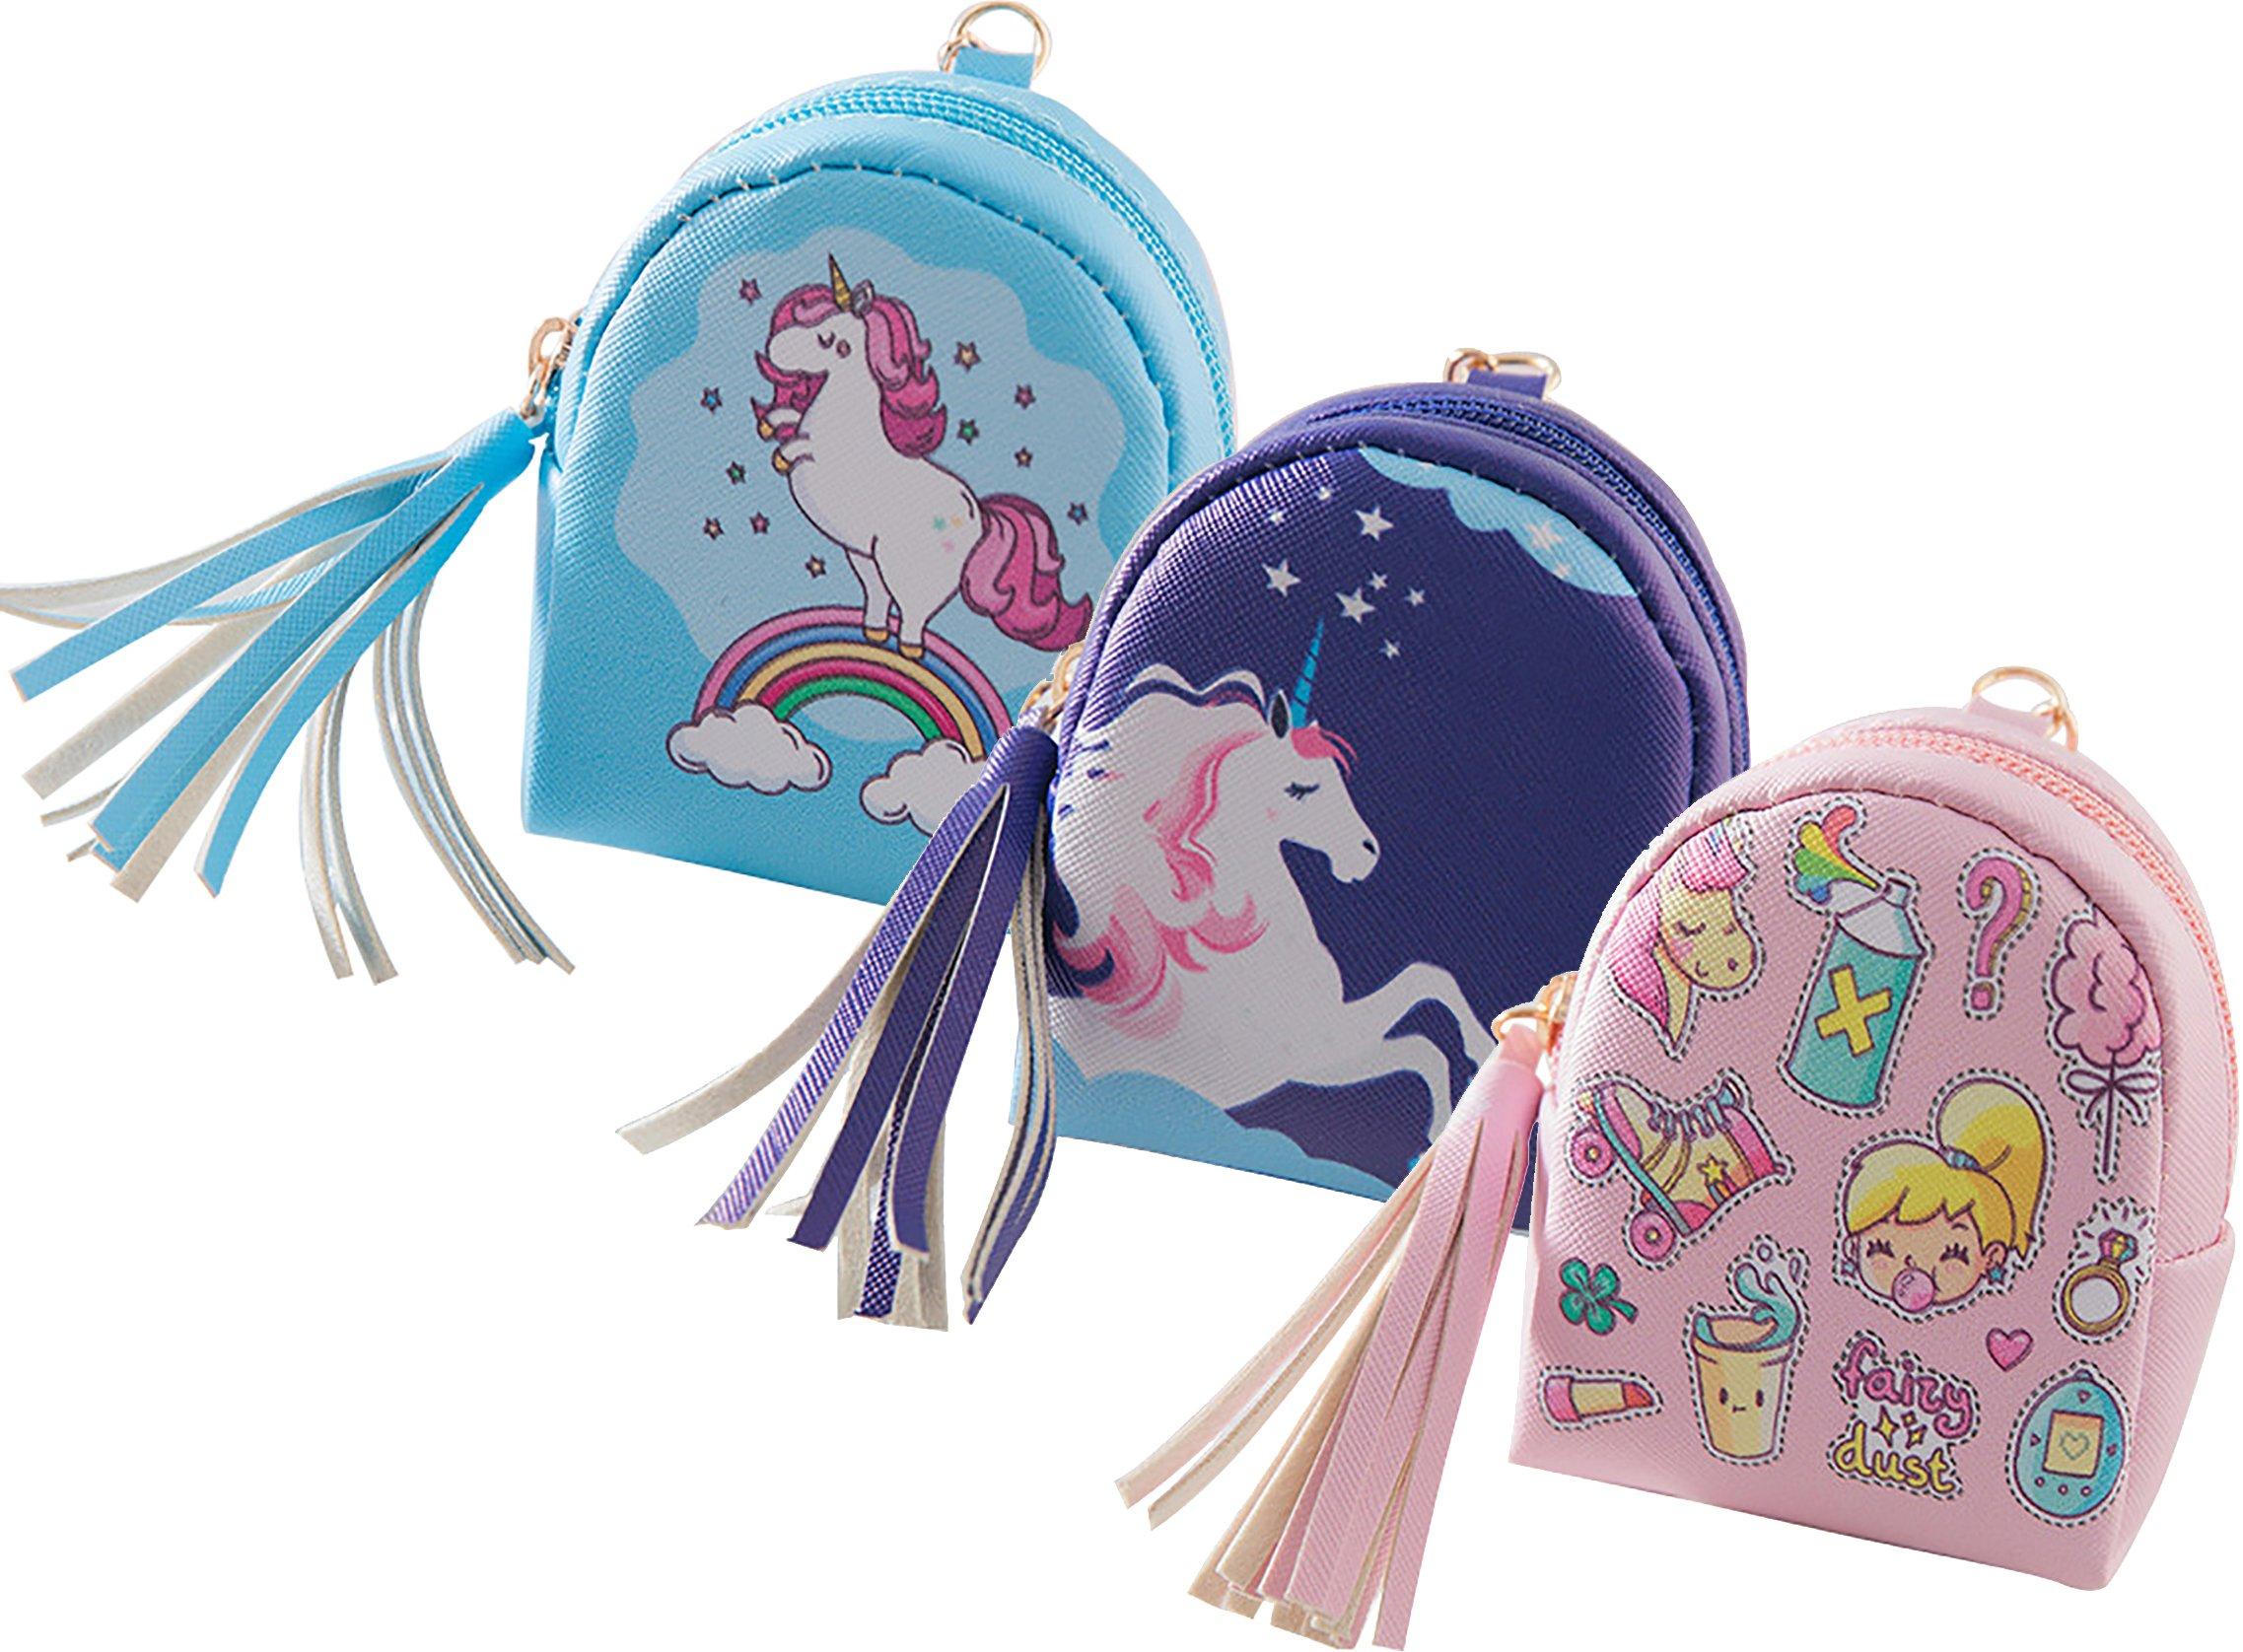 Ababalaya Creative Cartoon Unicorn Pattern Mini Backpack Coin Purse with Key Ring 4×3 inch,Group 5 by Ababalaya